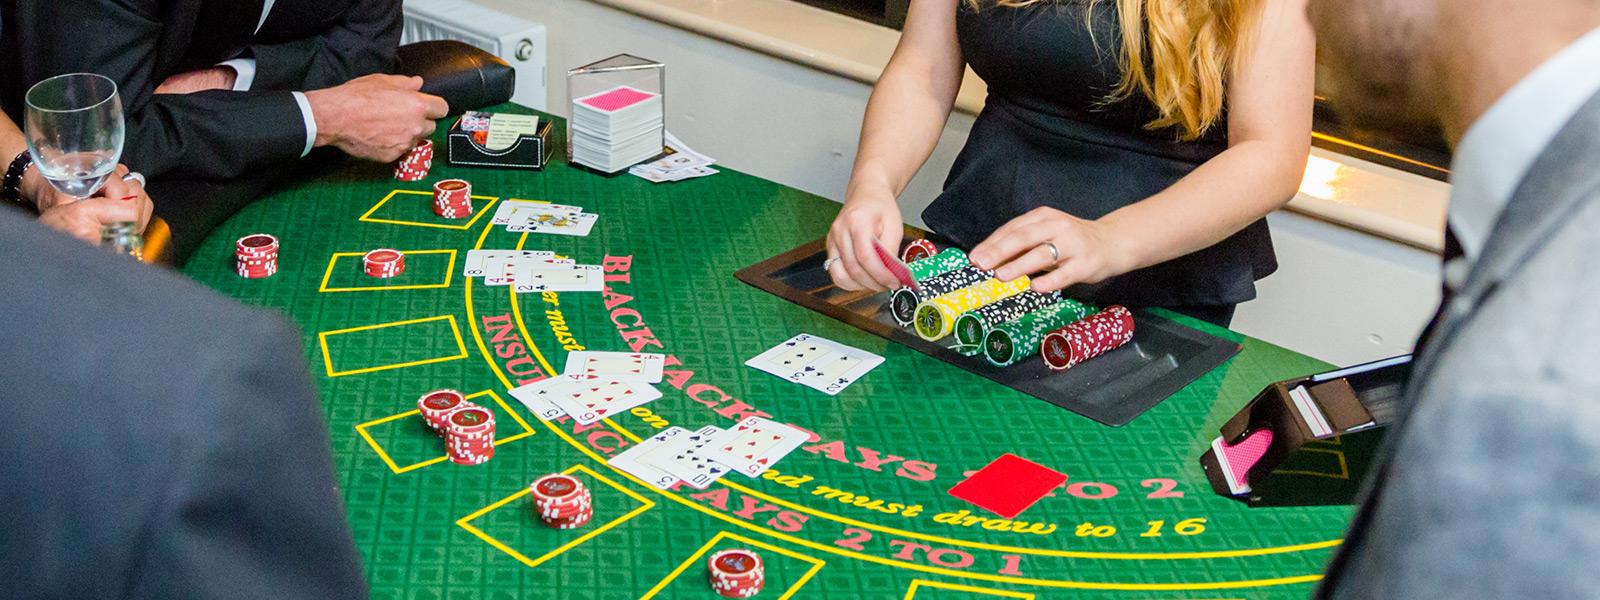 Gb Fun Casinos Casino Hire Stoke On Trent Staffordshire